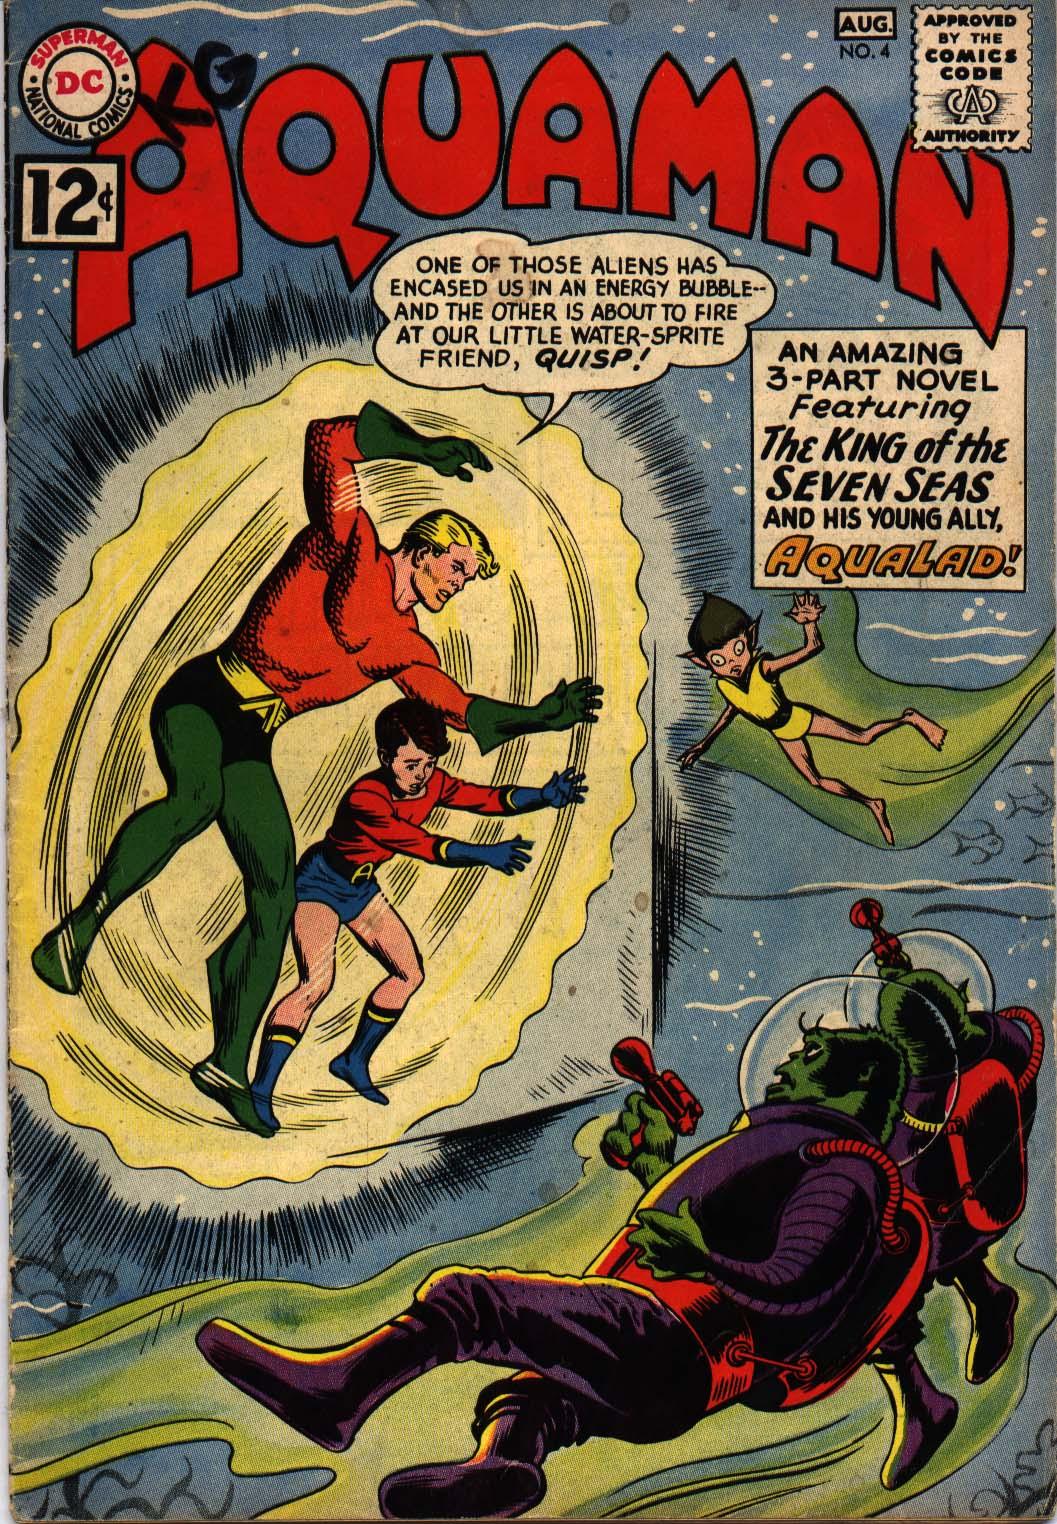 Aquaman (1962) issue 4 - Page 1